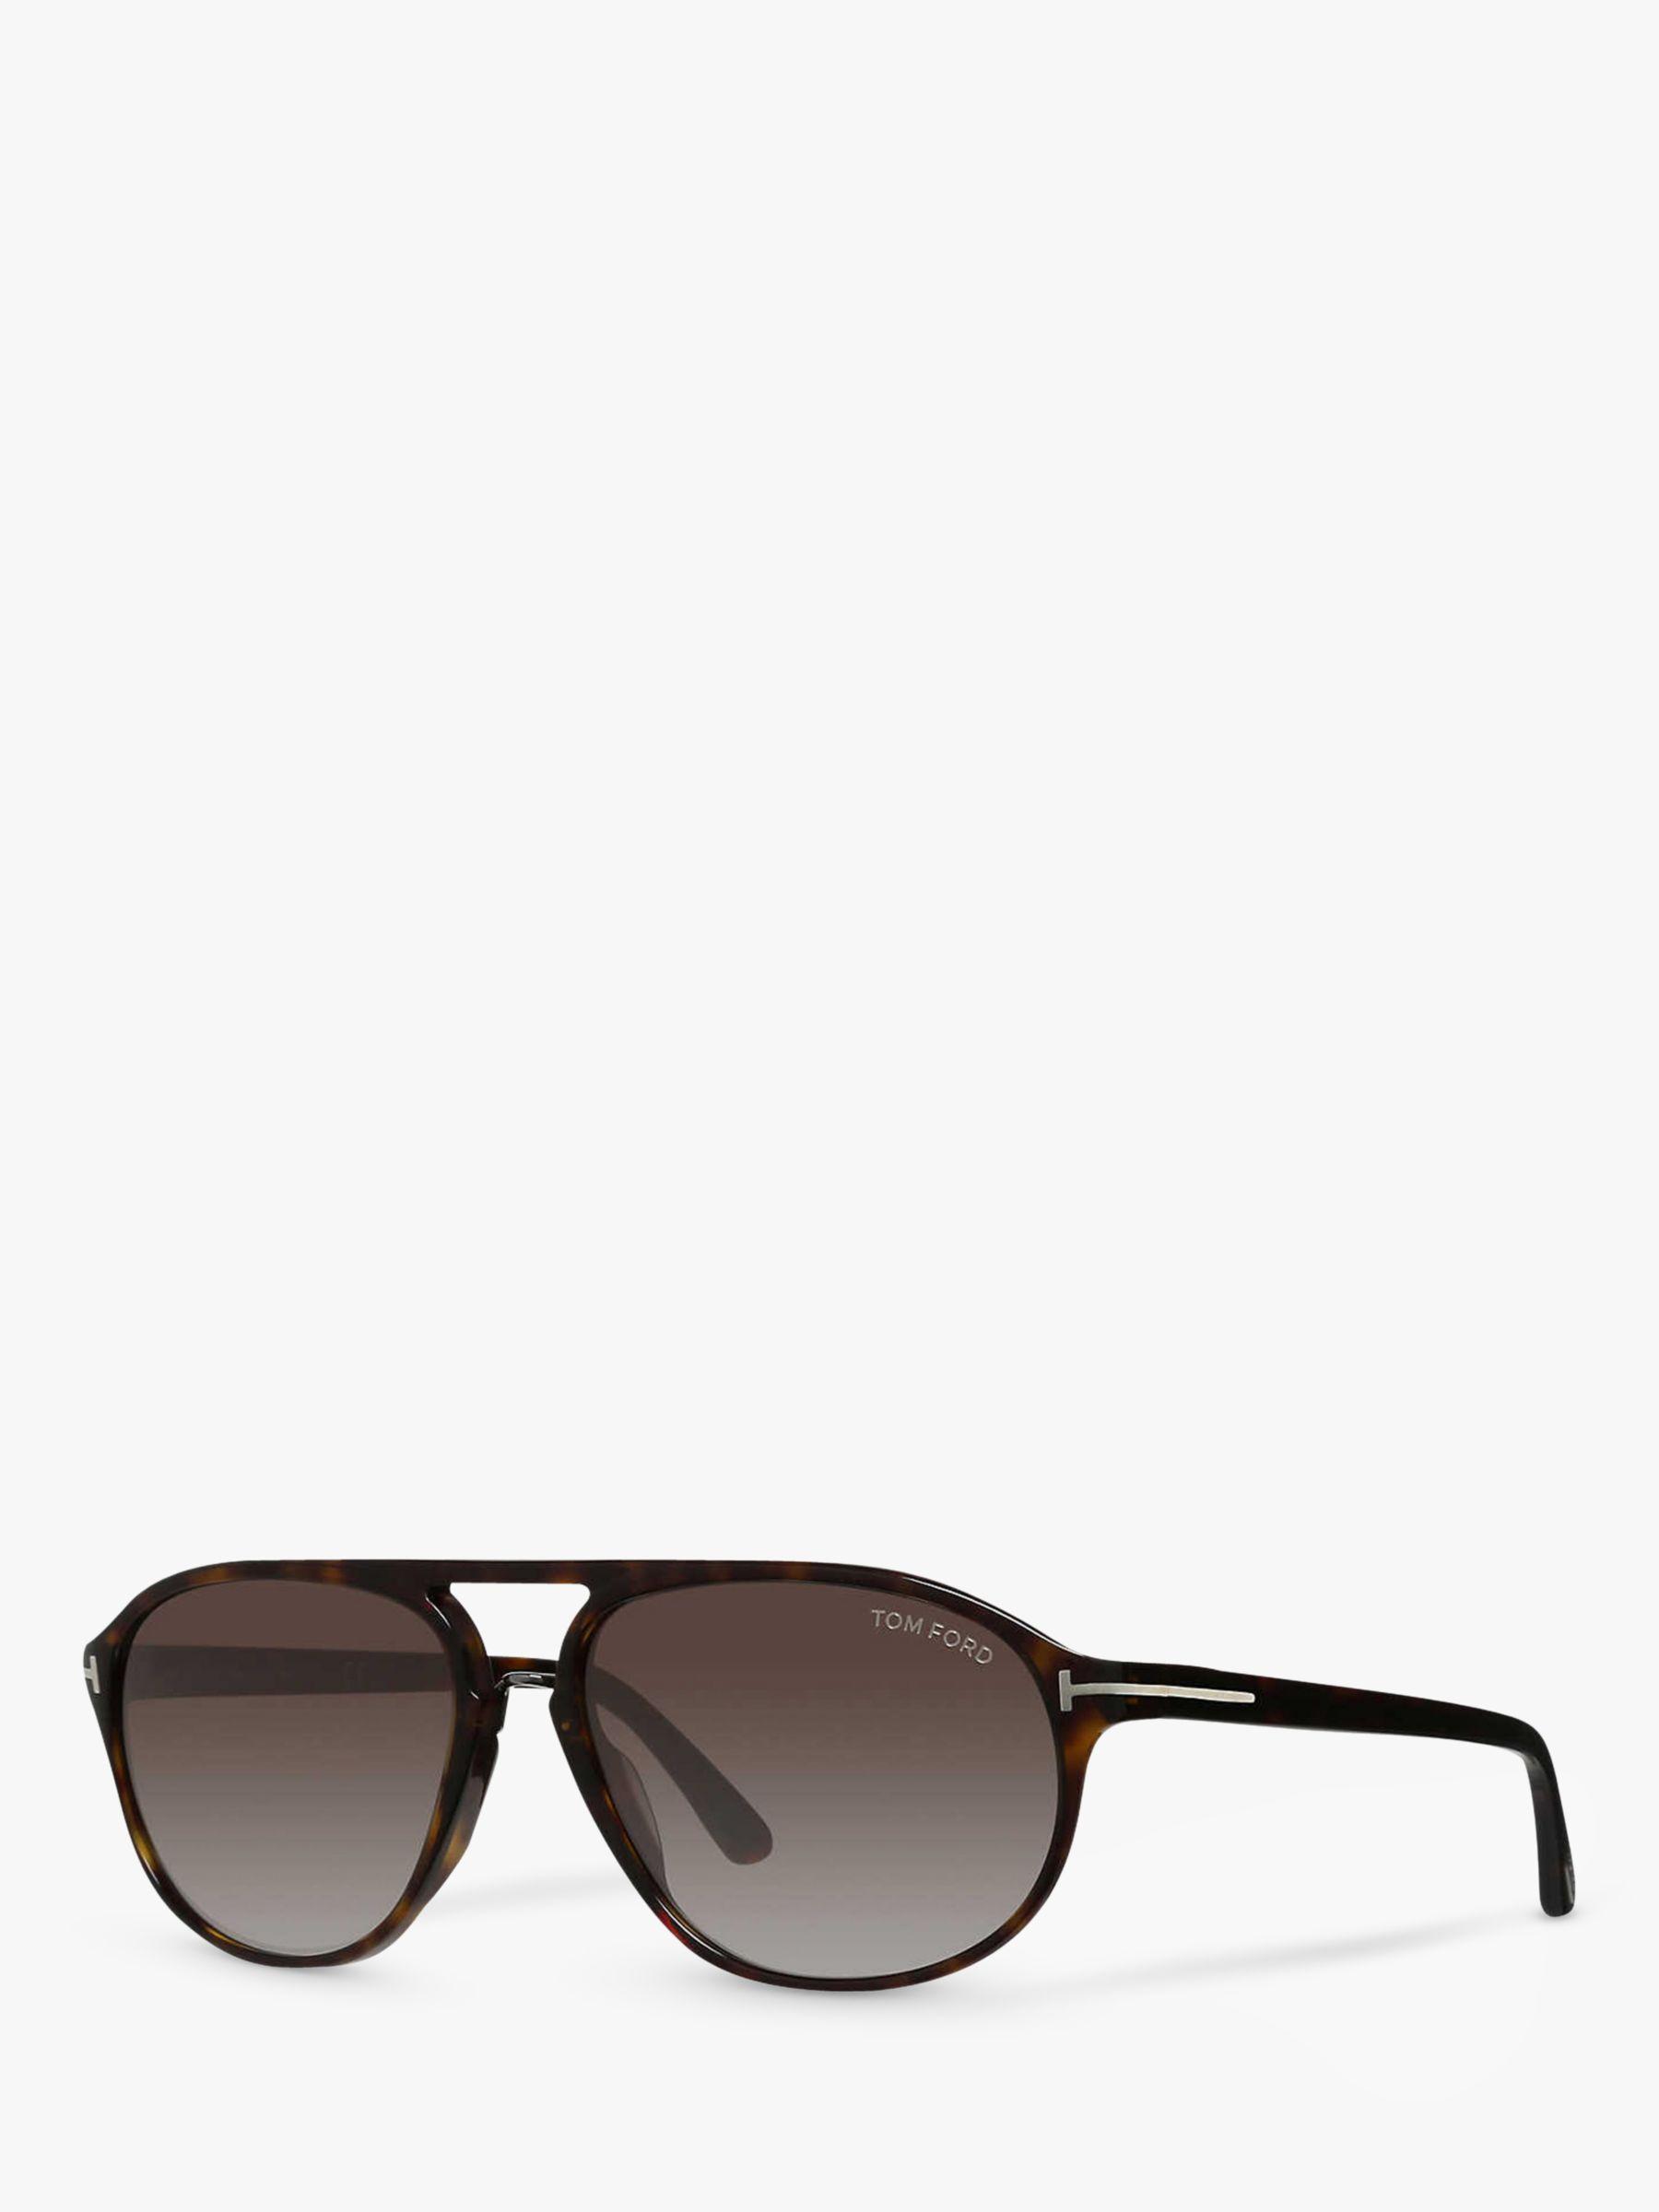 Tom Ford TOM FORD FT0447 Jacob Gradient Aviator Sunglasses, Brown